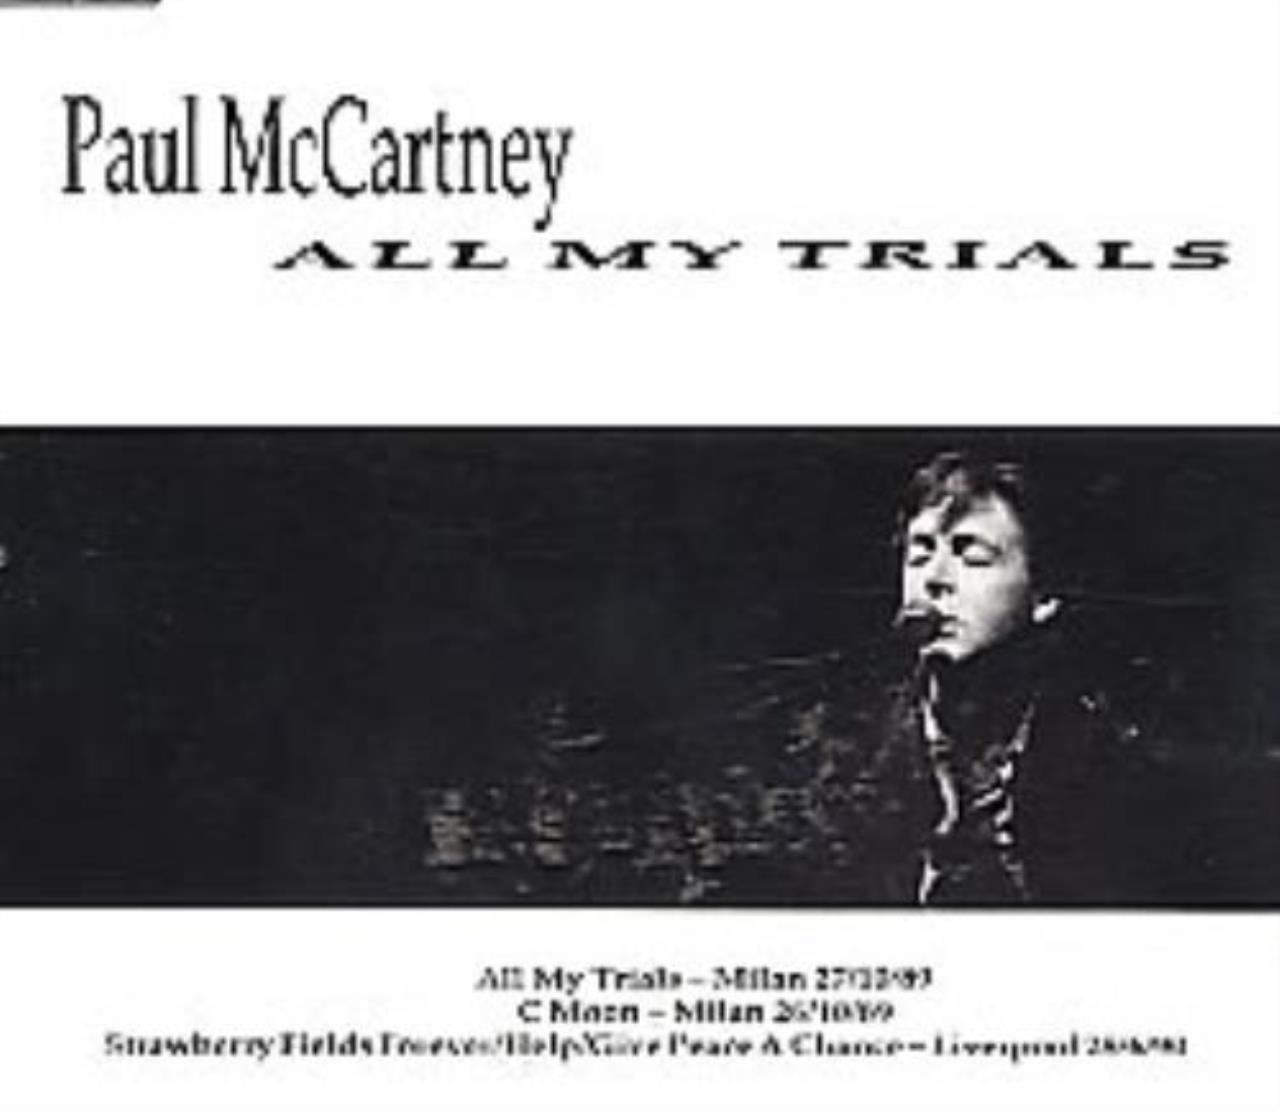 paul mccartney all my trials 4 track ep amazon com music